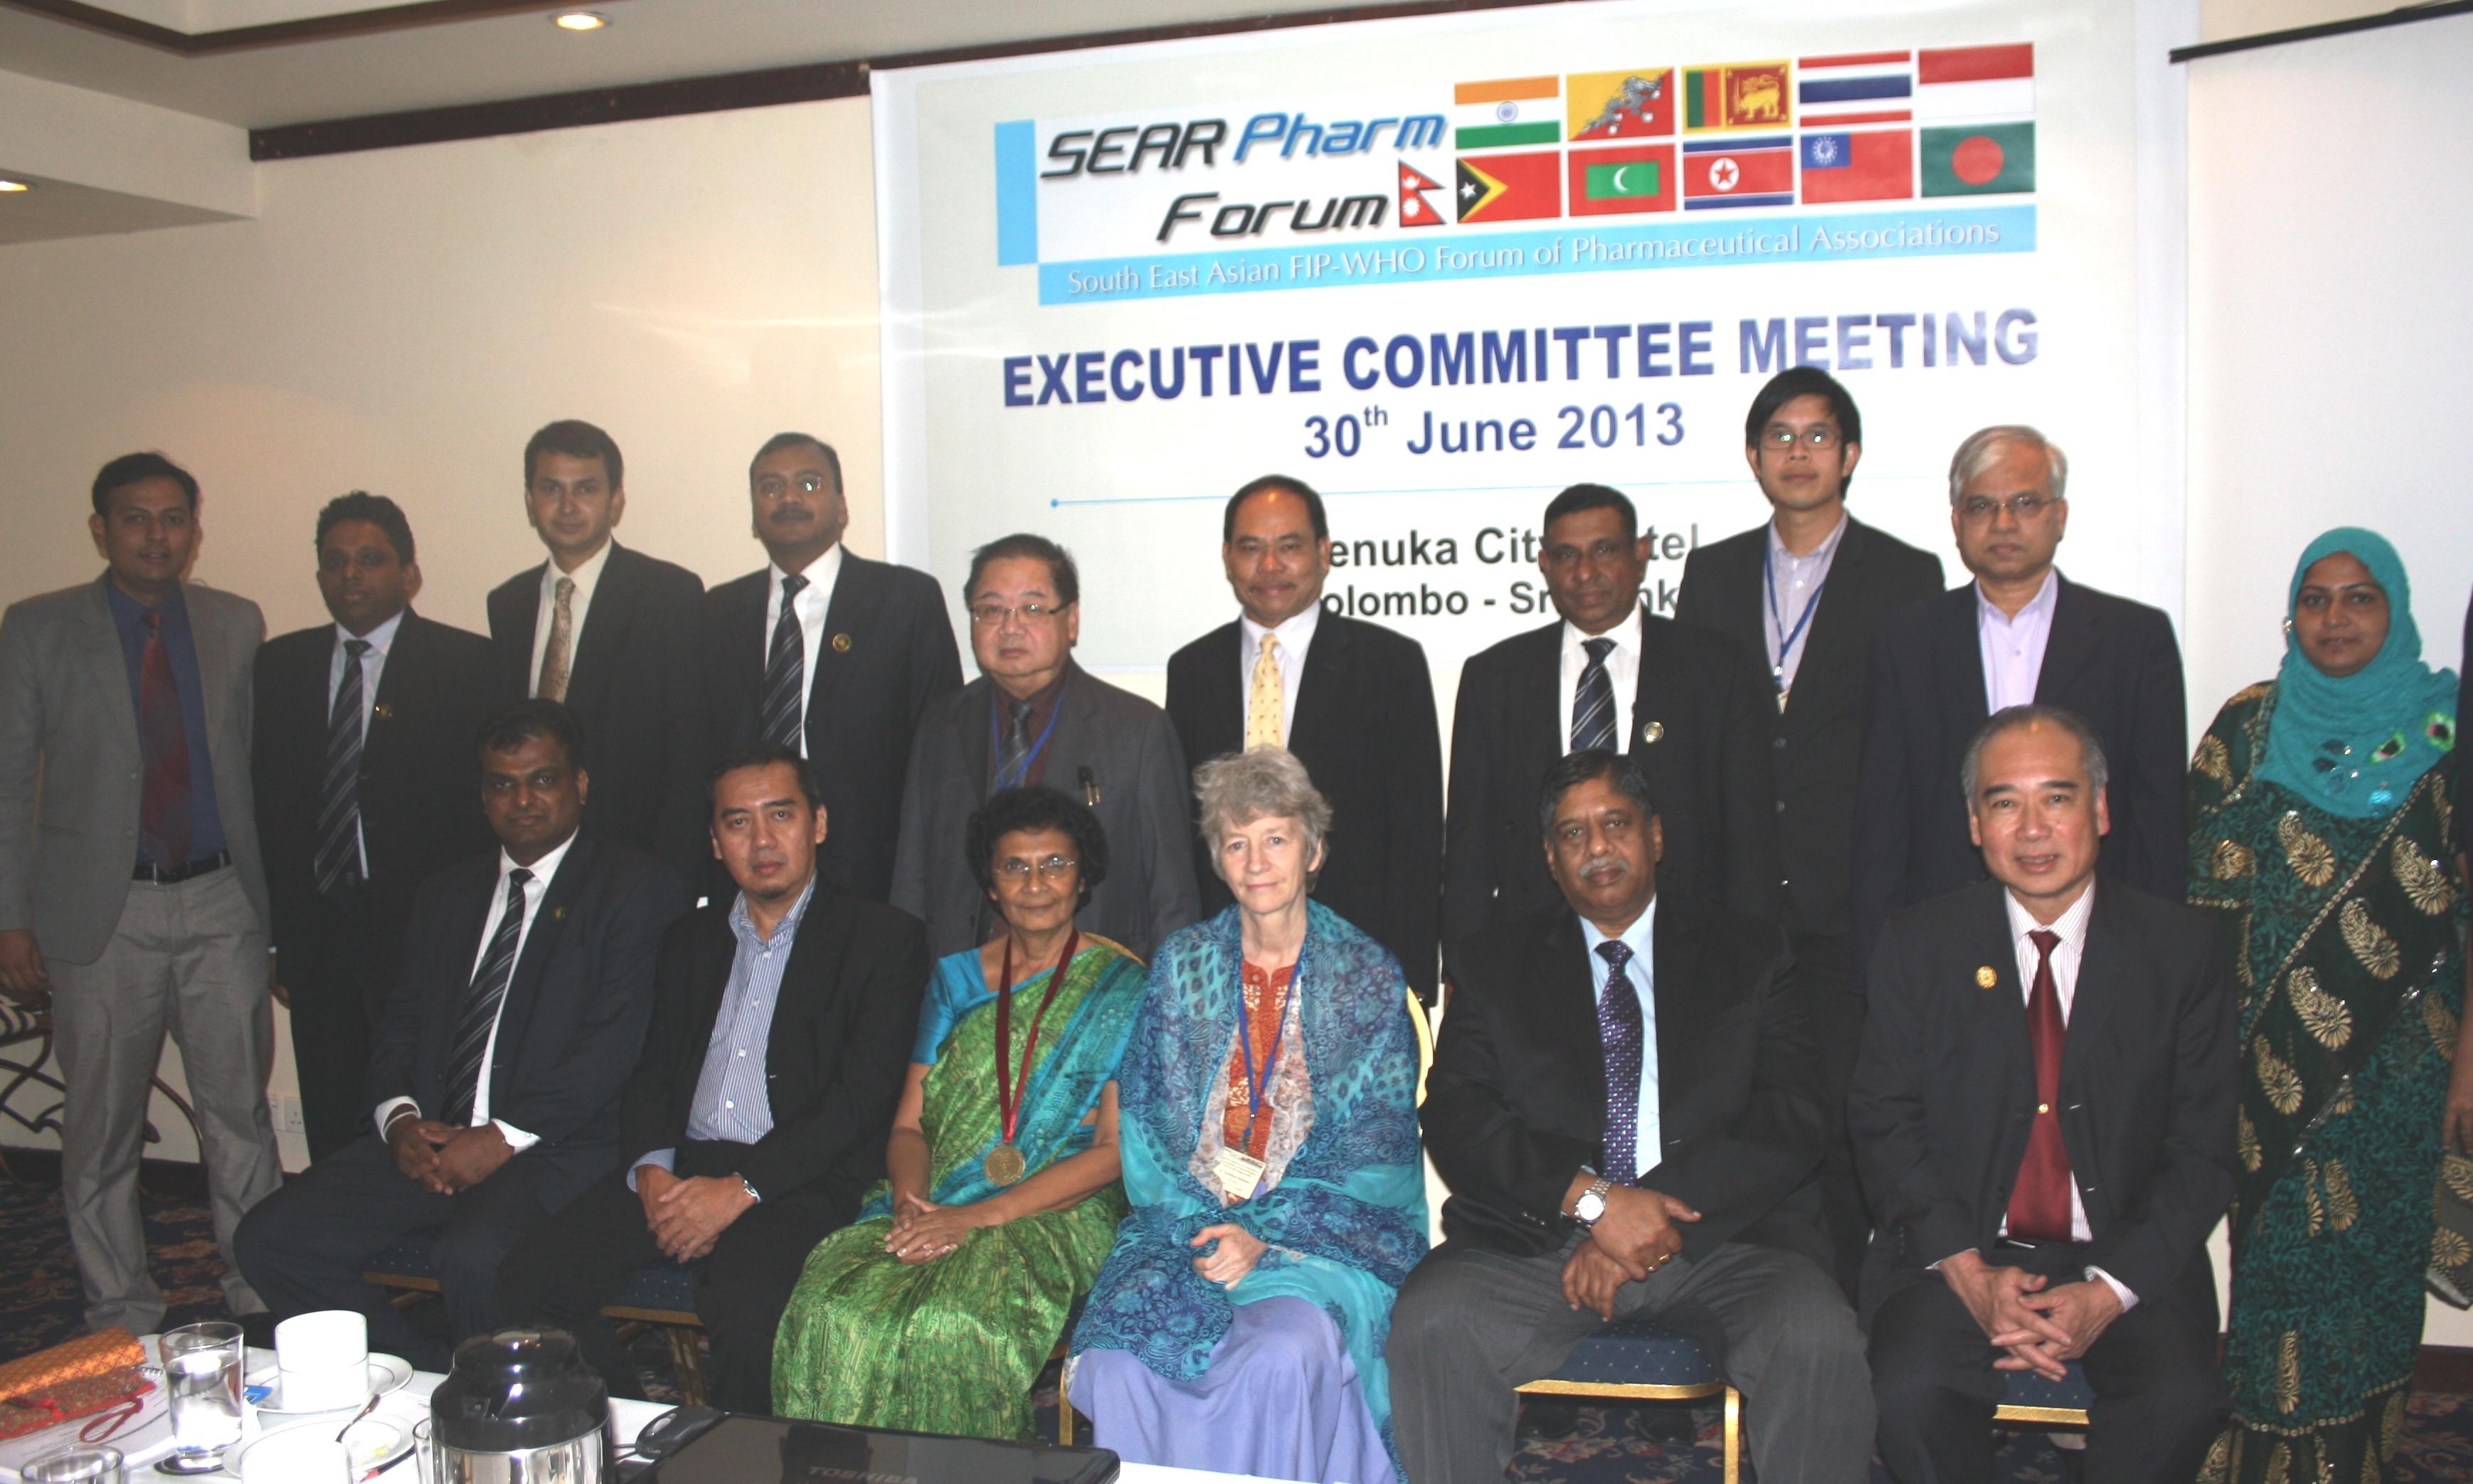 SEARPharm Forum EC Meeting 2013